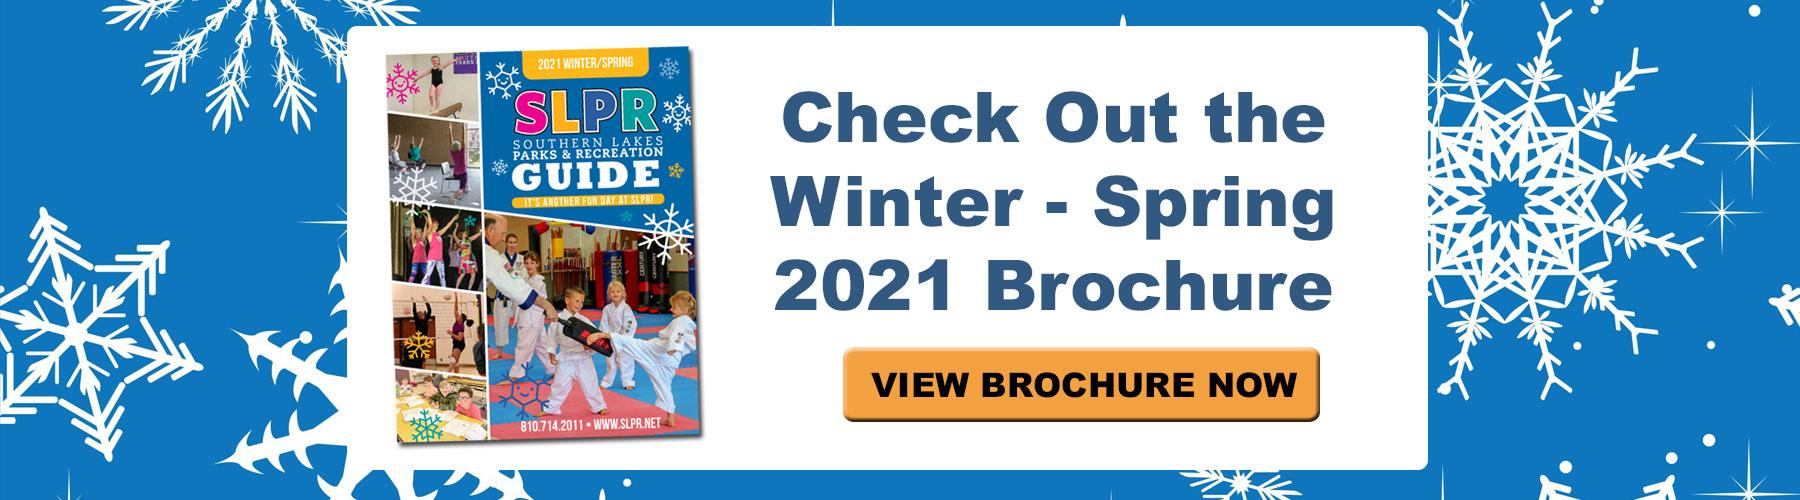 SLPR Winter 2021 Brochure